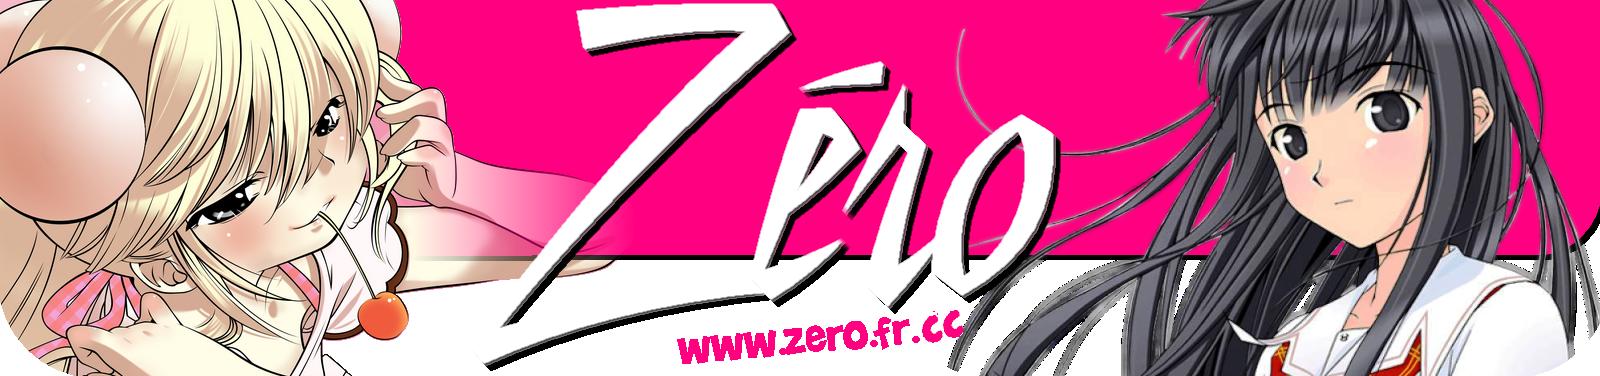 Zéro ~fansub~ :: db0 company Index du Forum